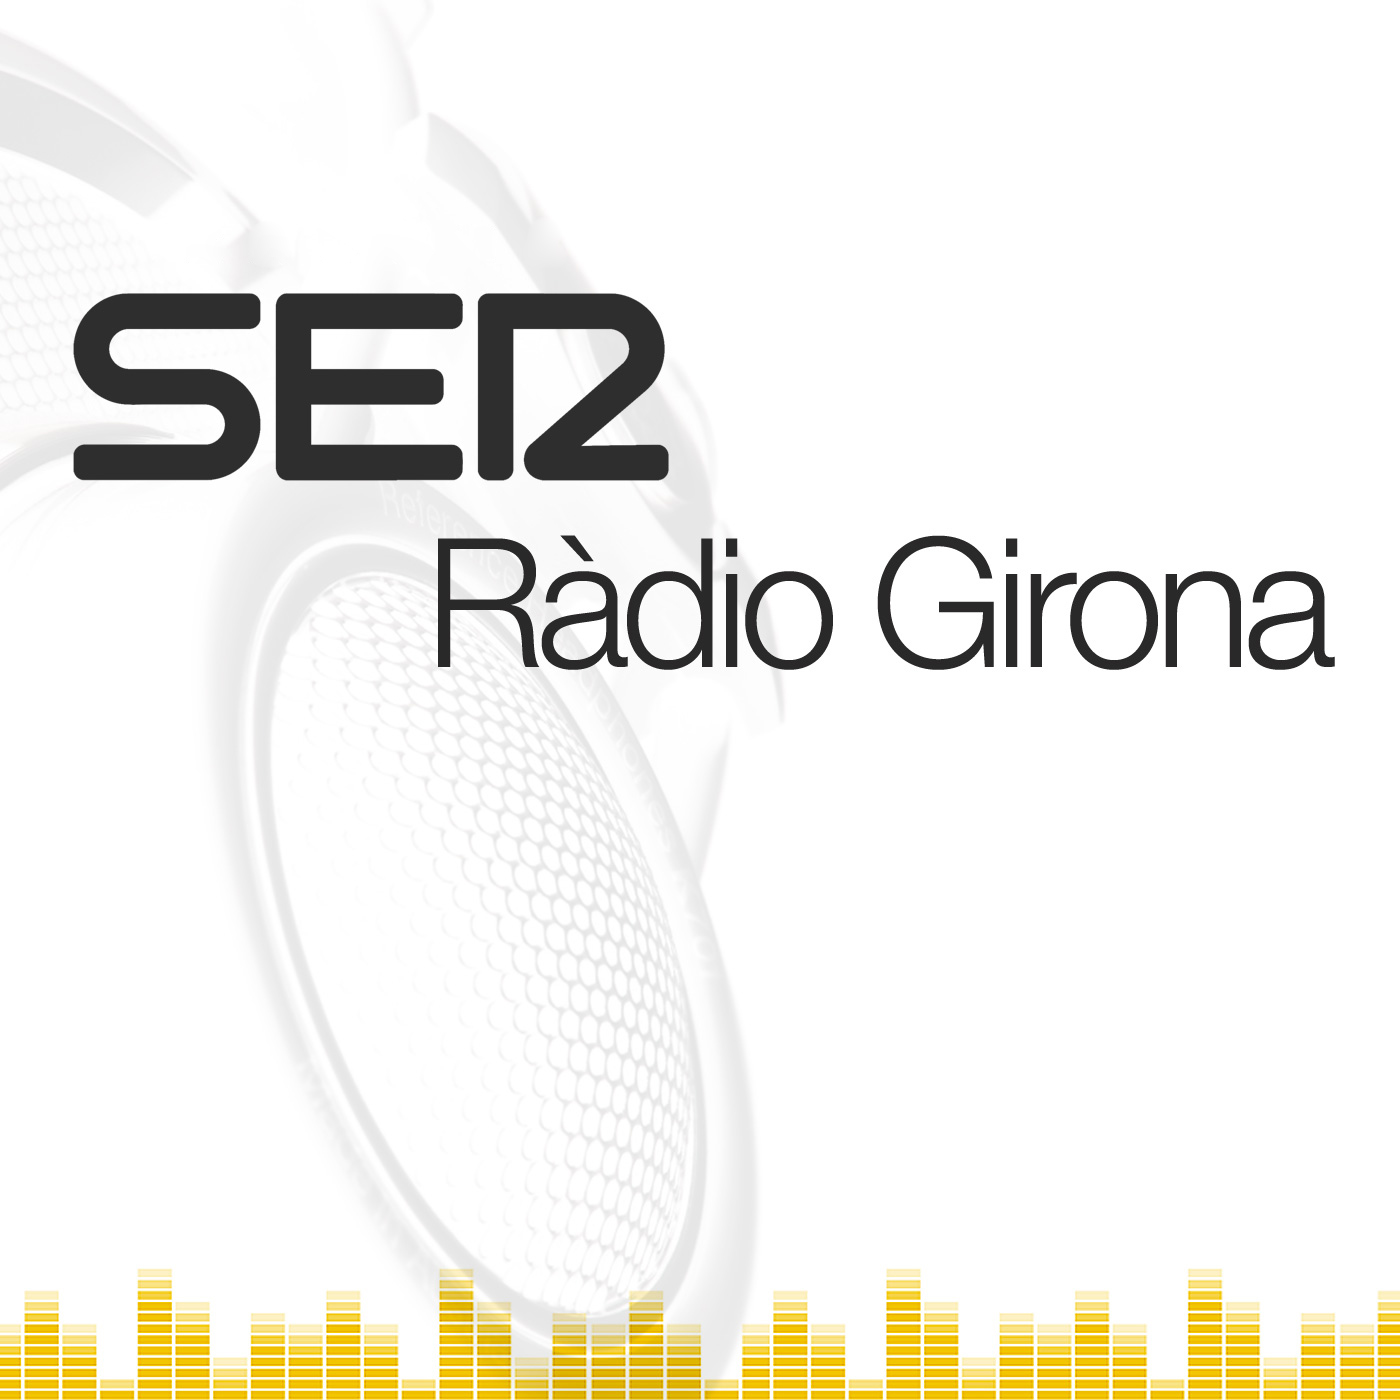 Radio Girona